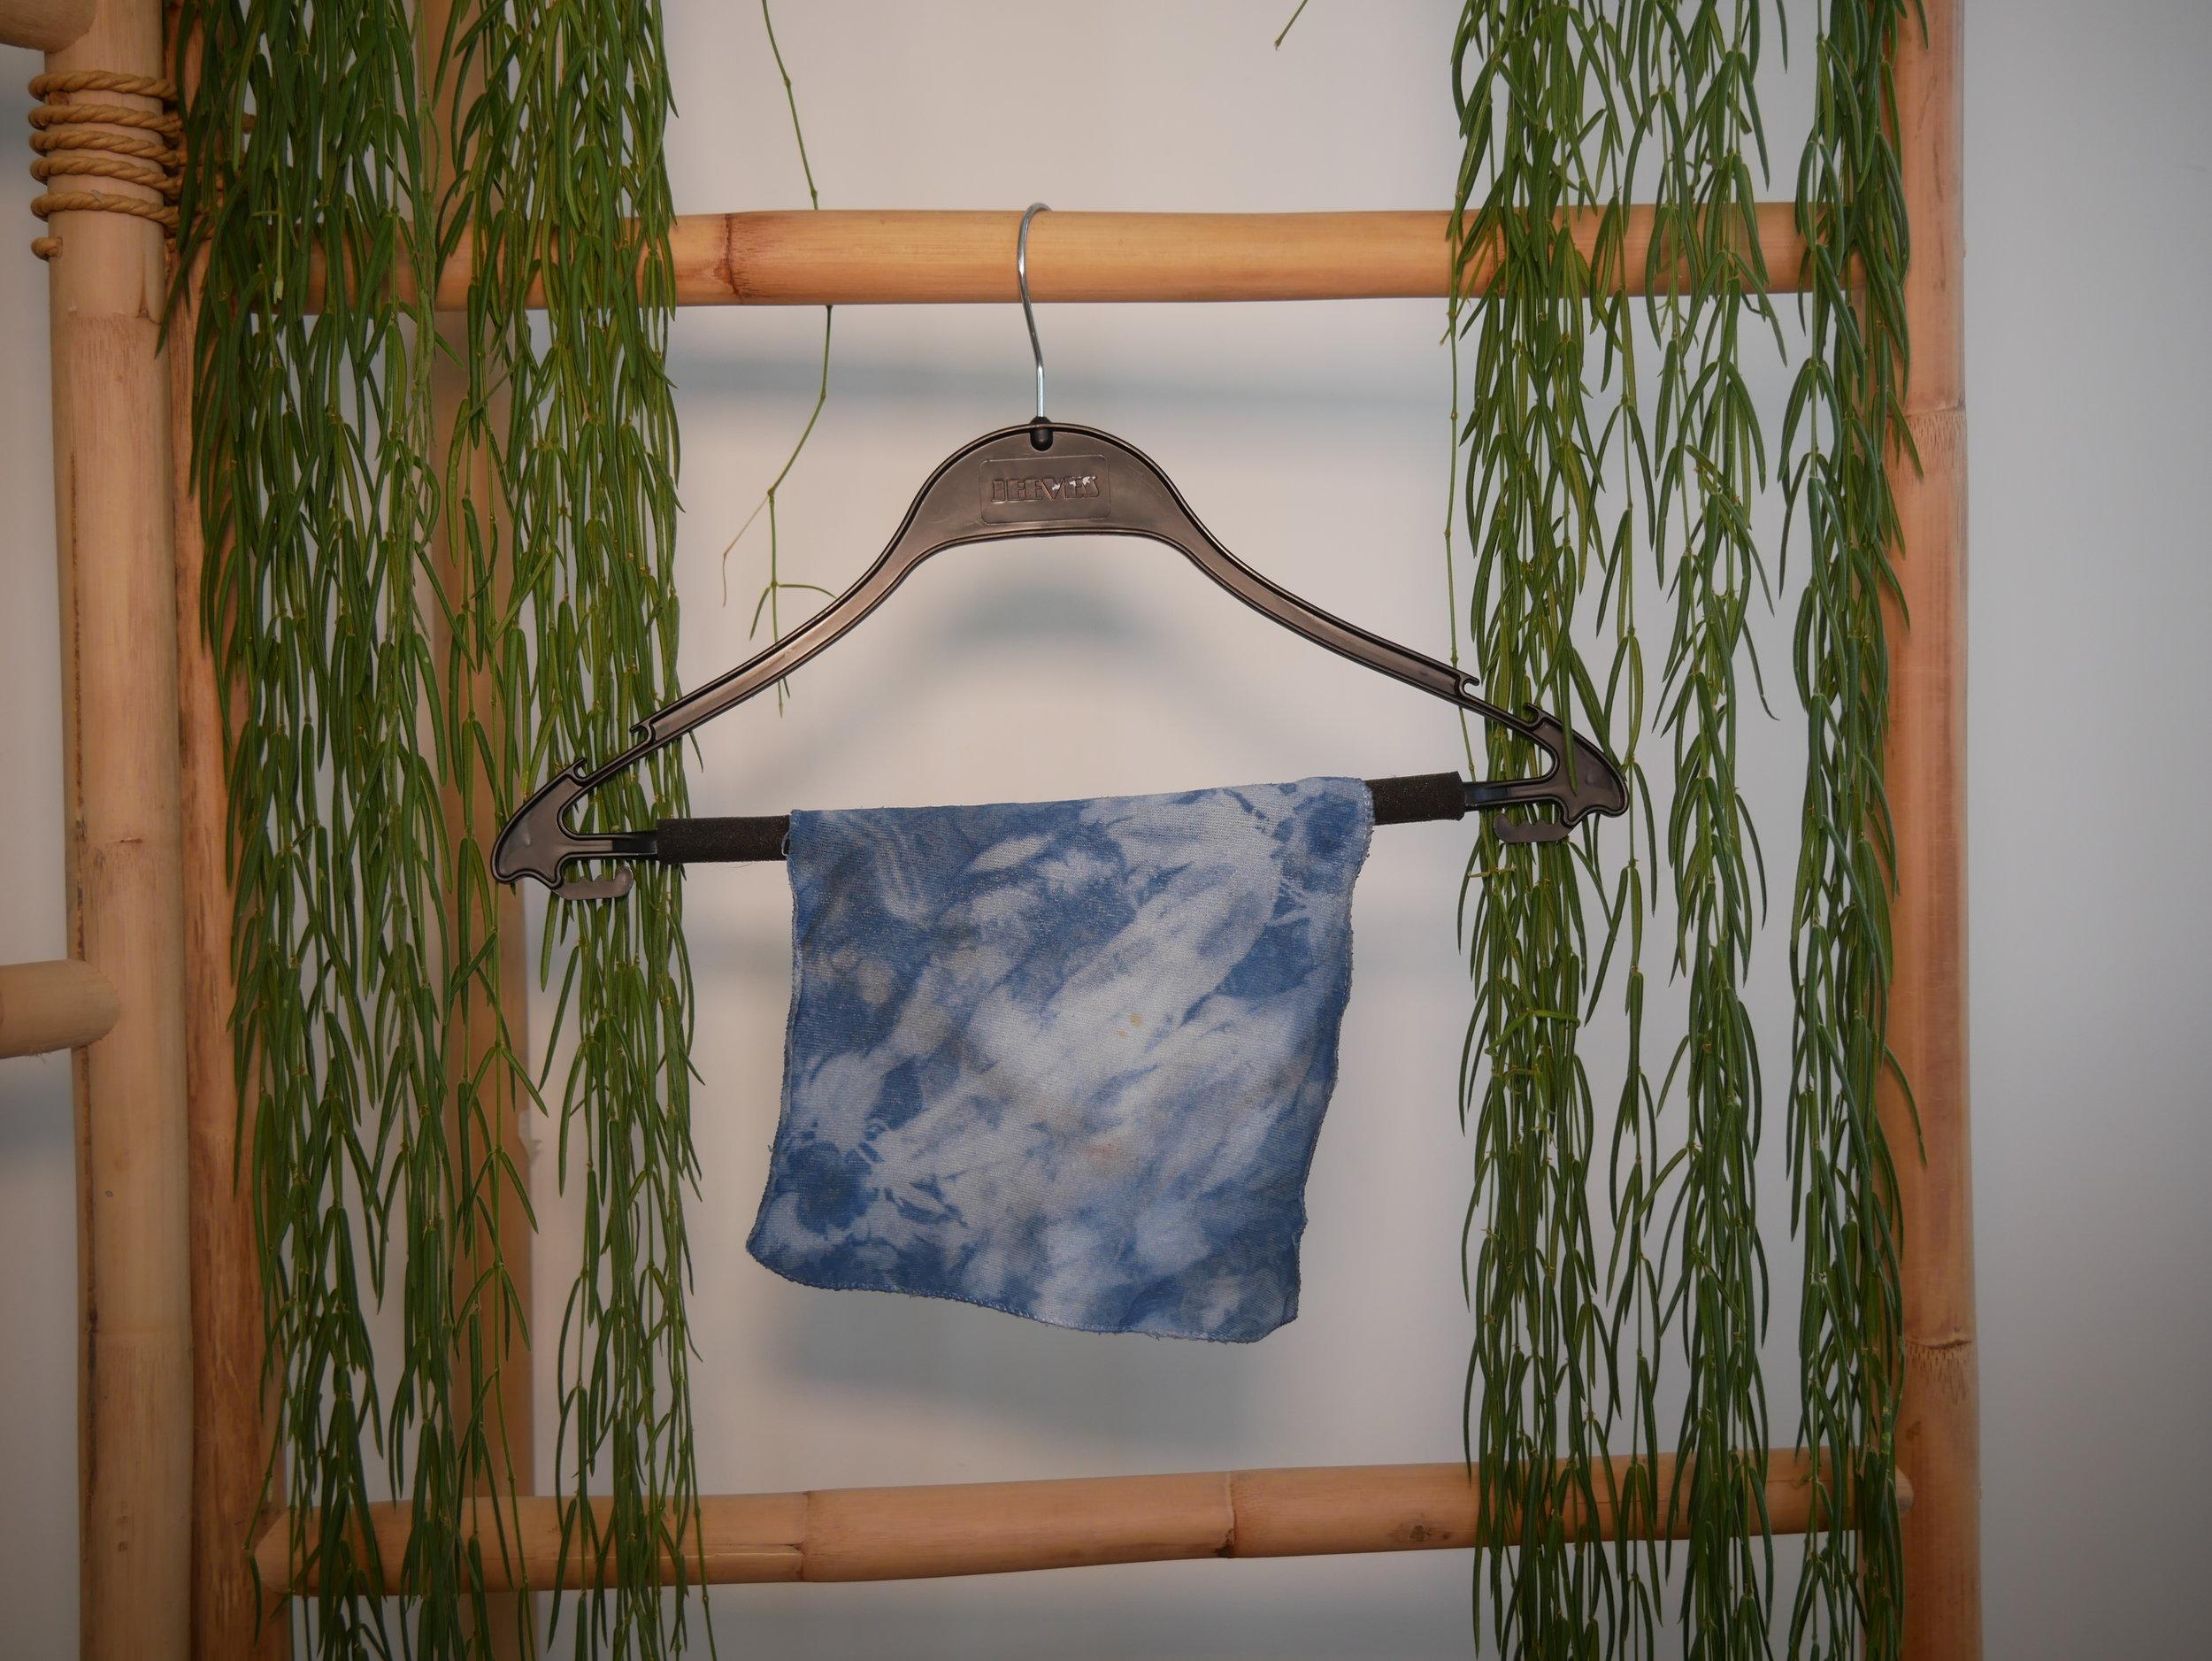 Shibori Indigo Dyed Towel  by Sheenie Lee  HK$99,999